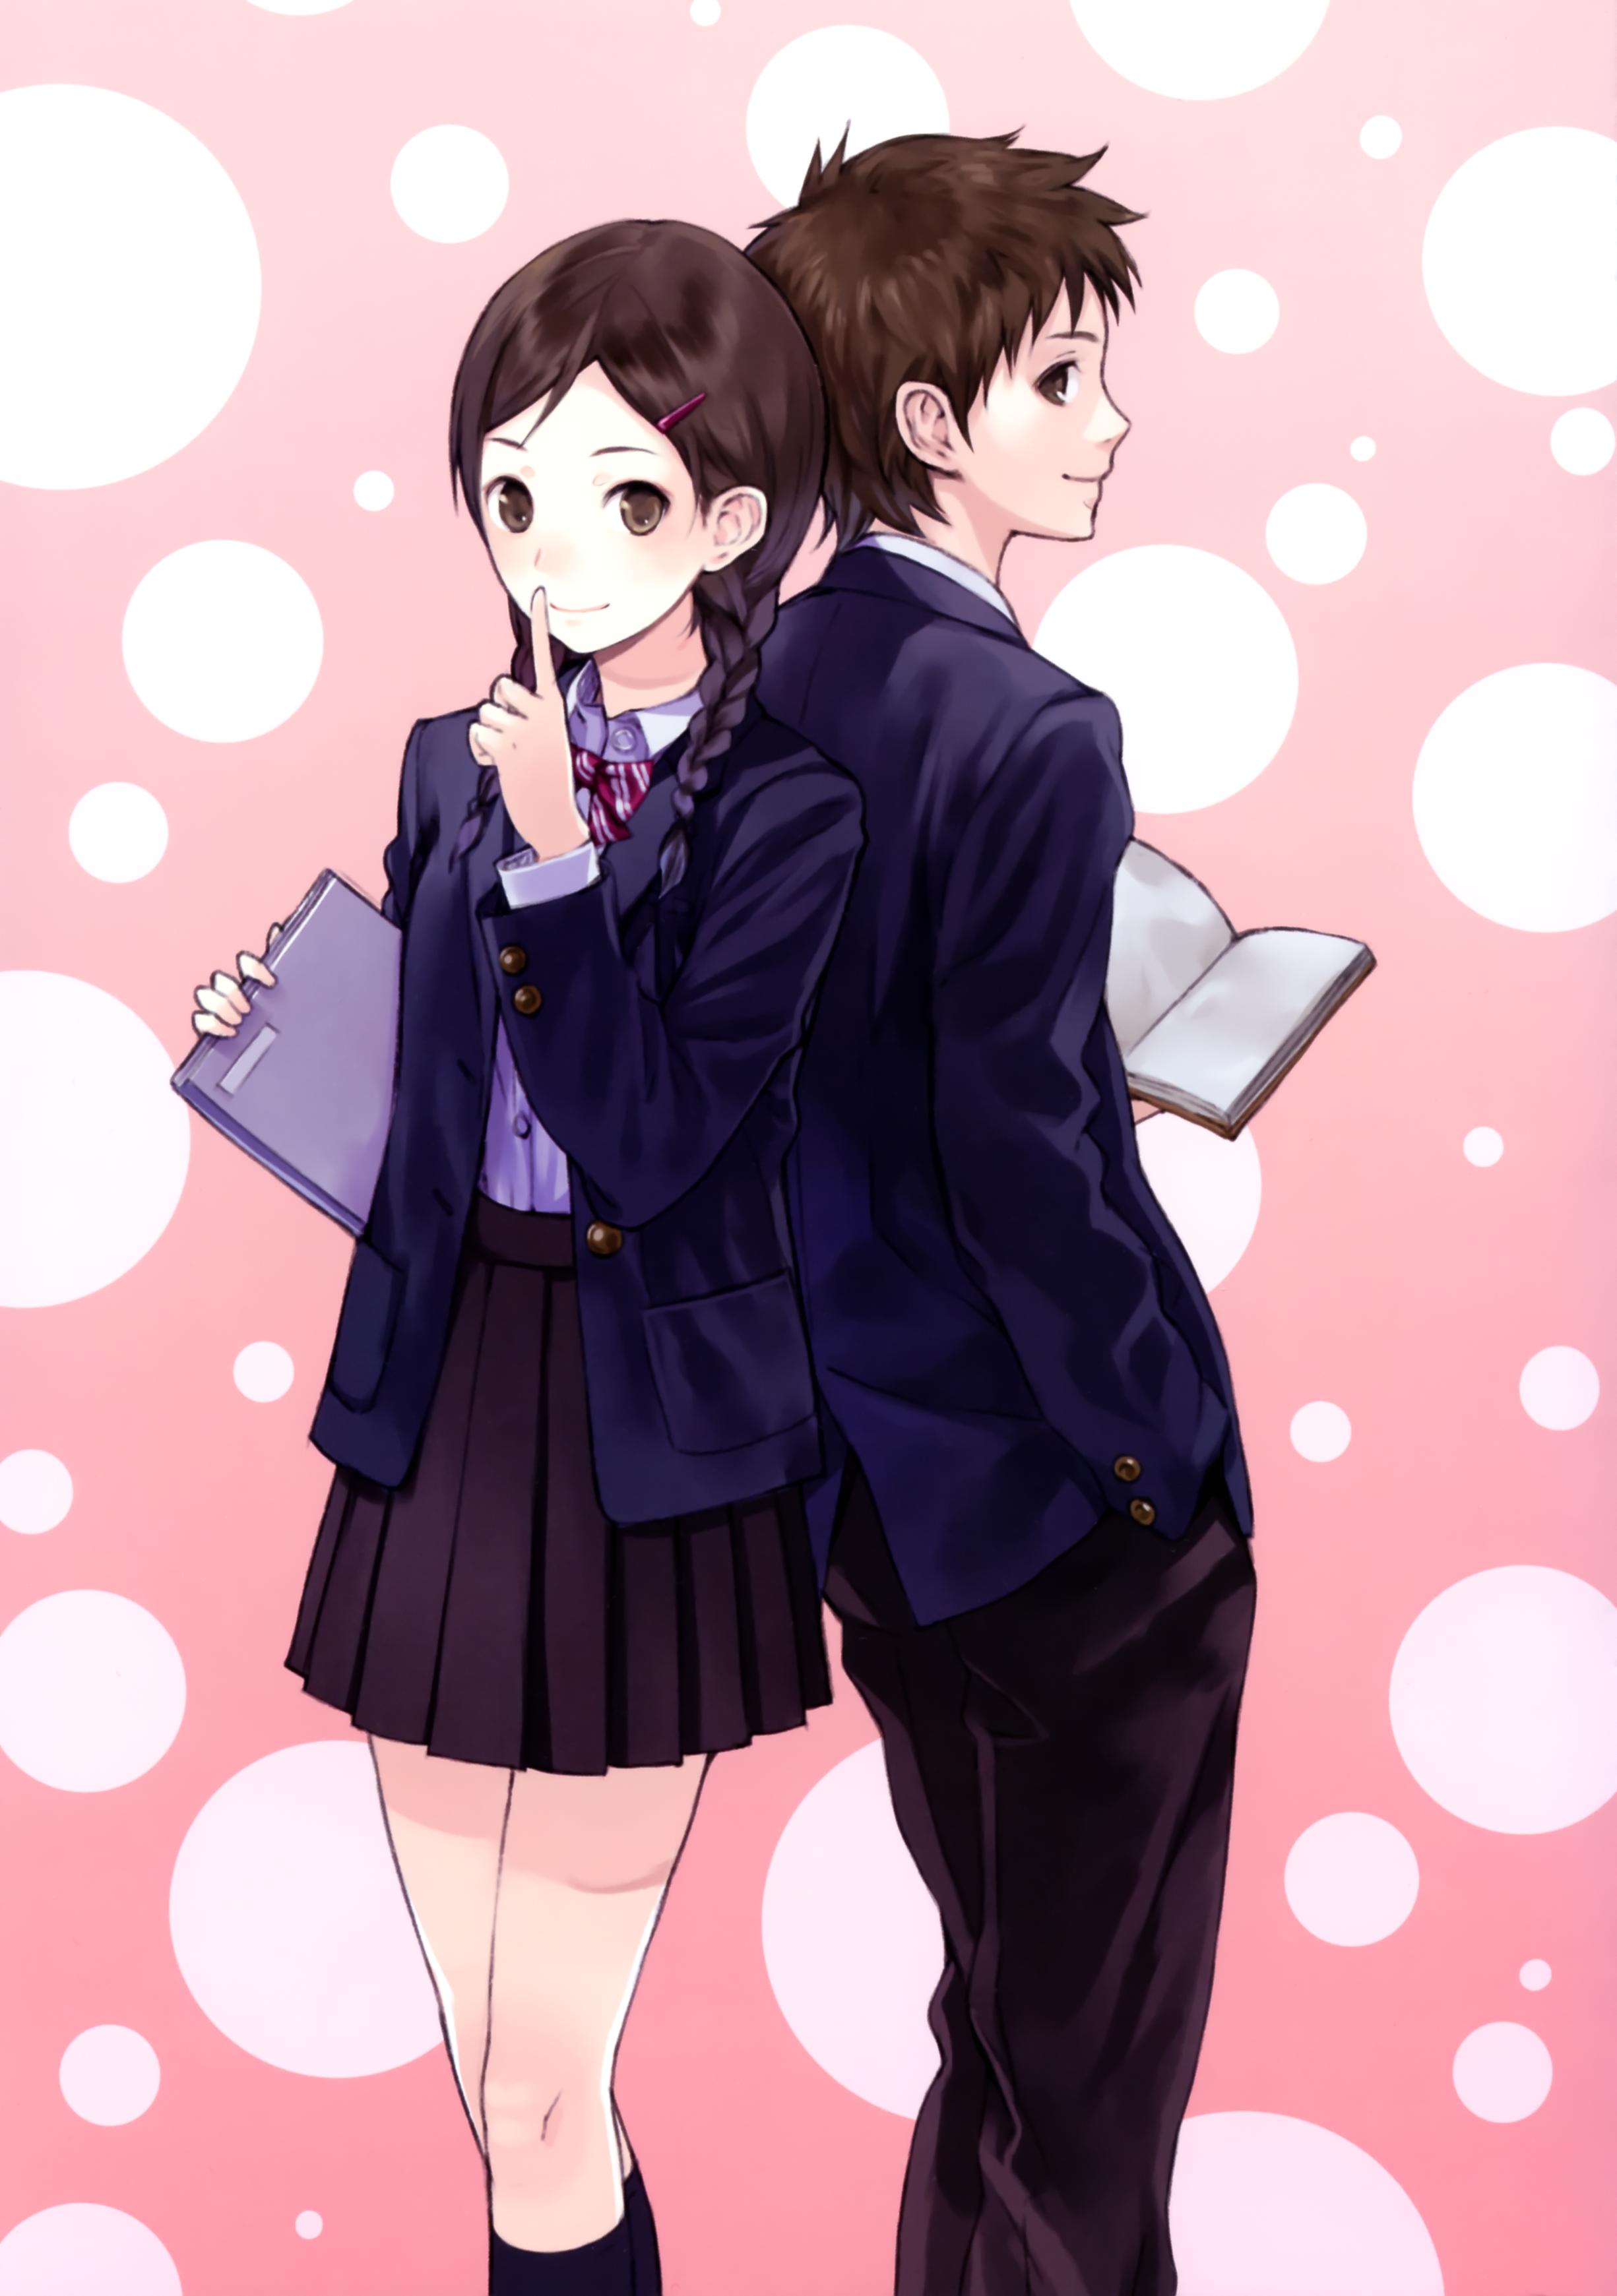 students by Kishida Mel anime illustration Original